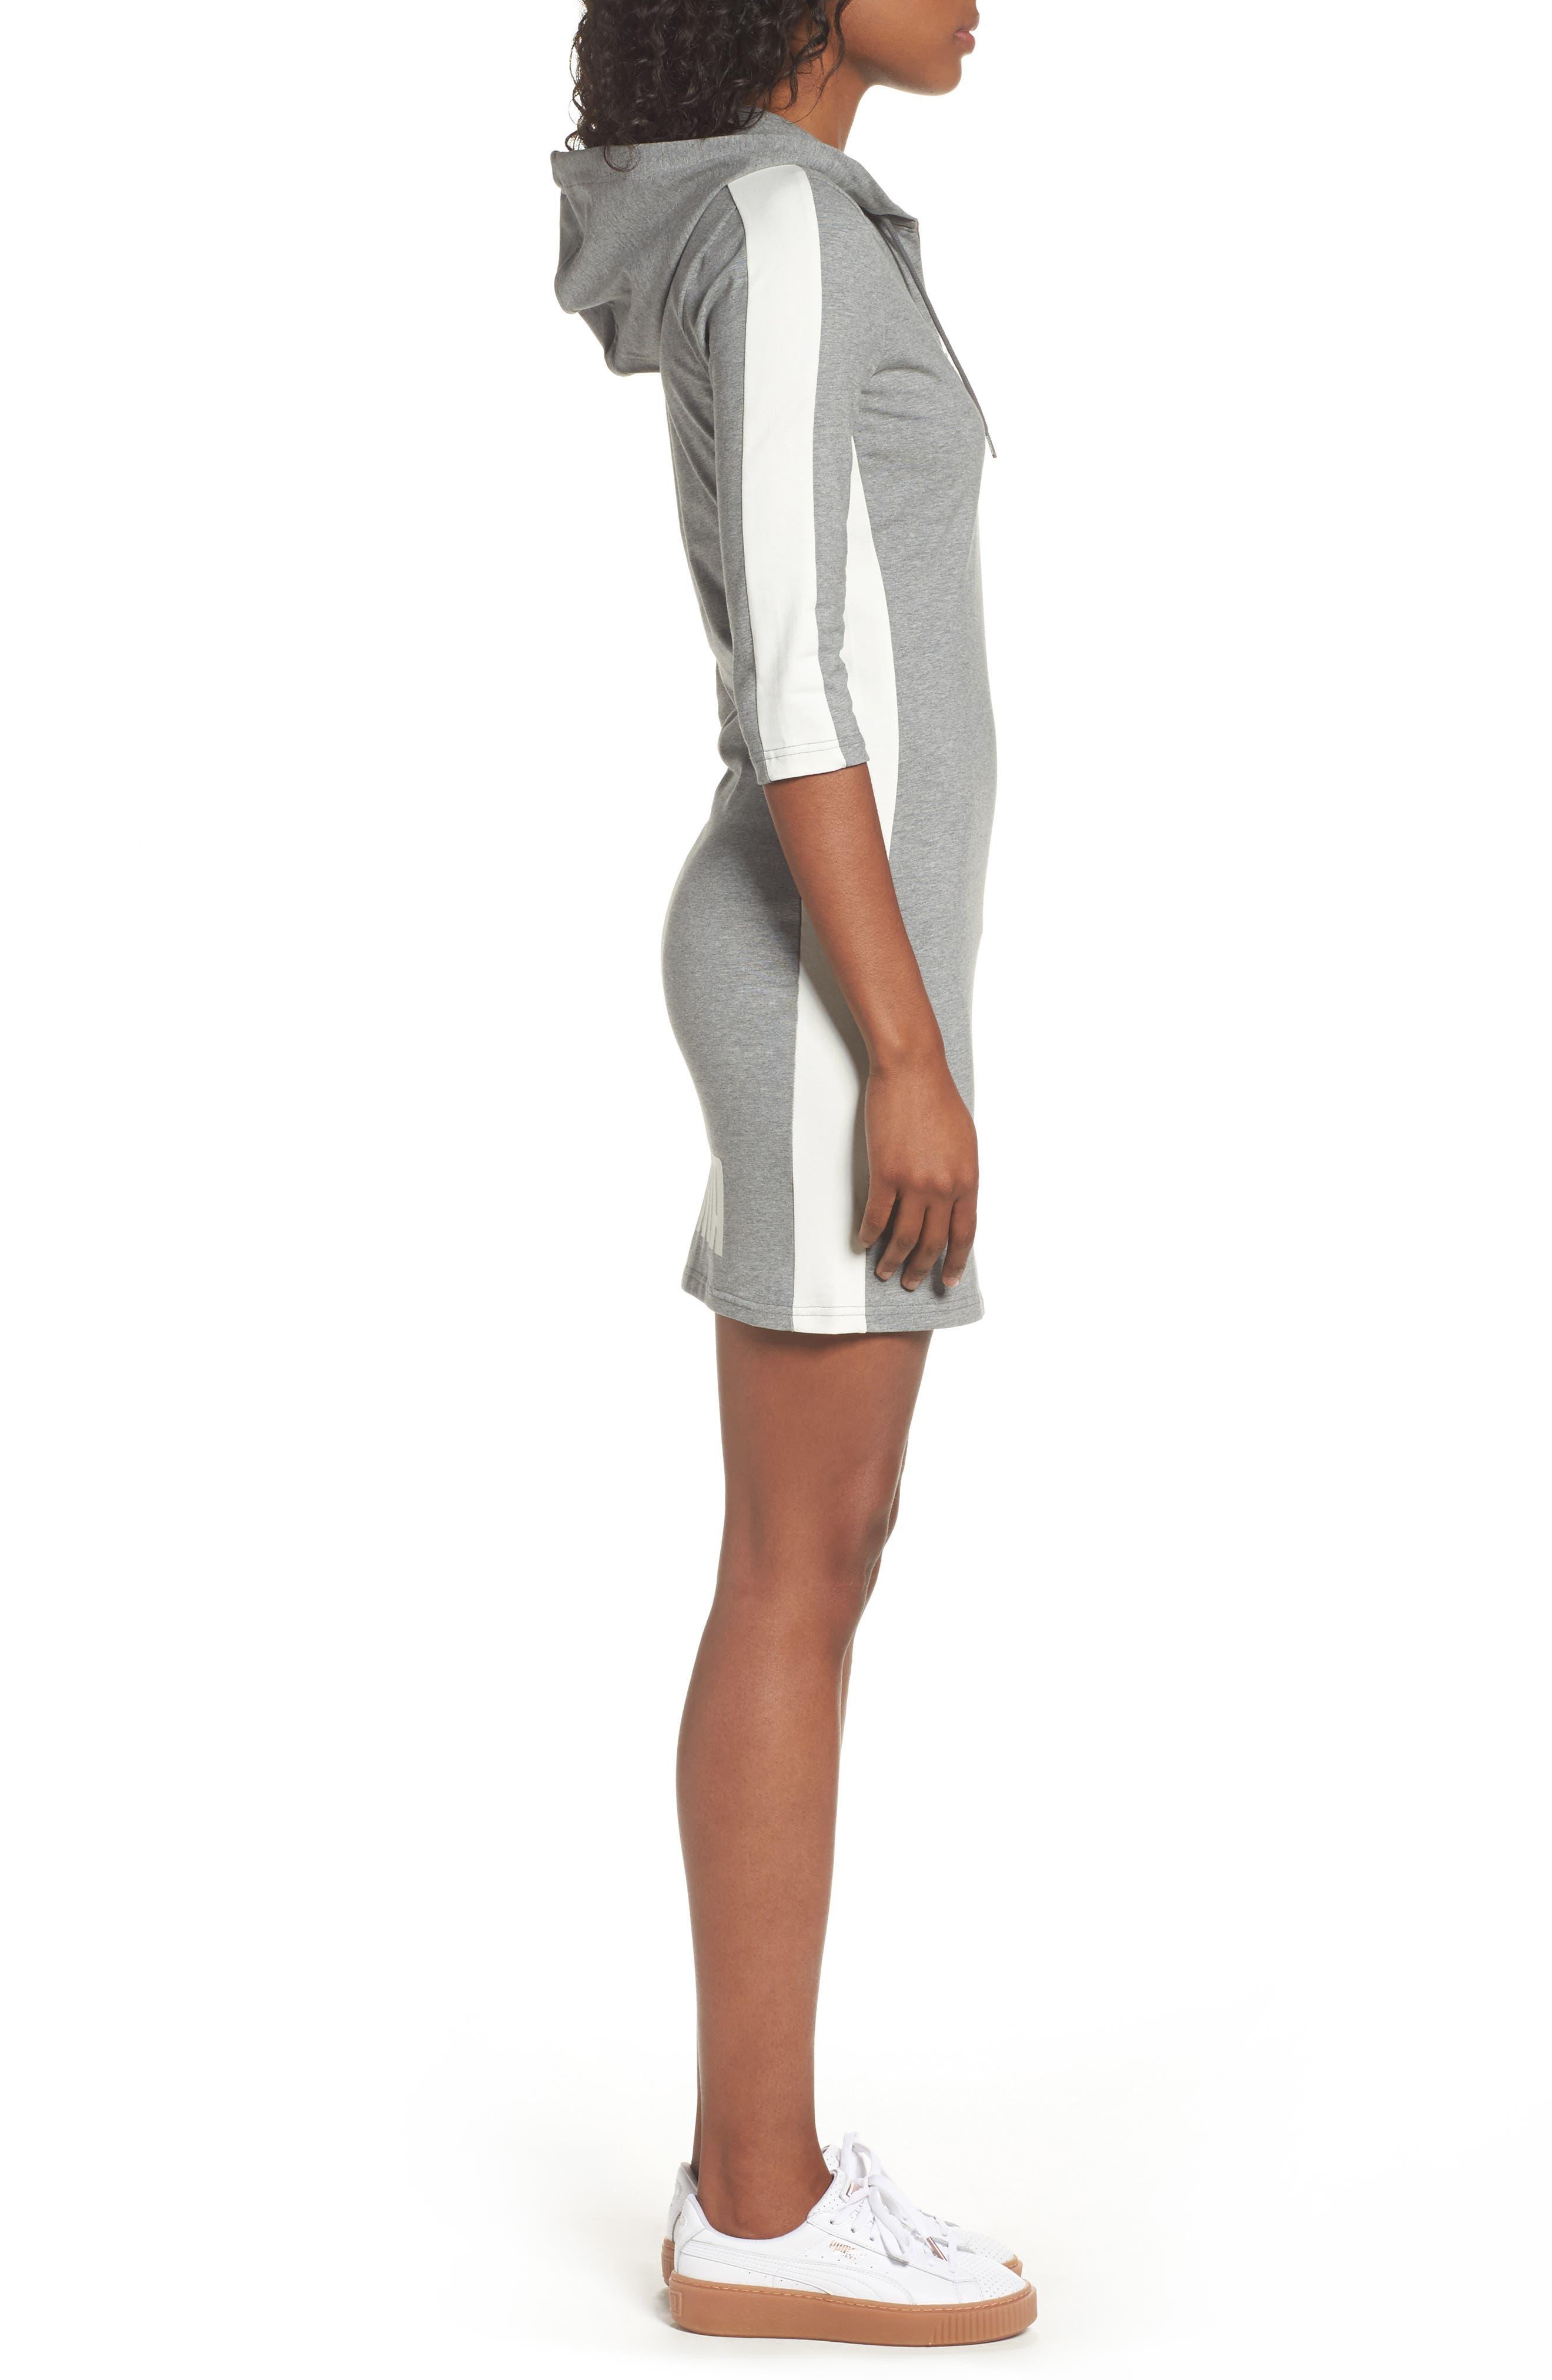 T7 Sweatshirt Dress,                             Alternate thumbnail 12, color,